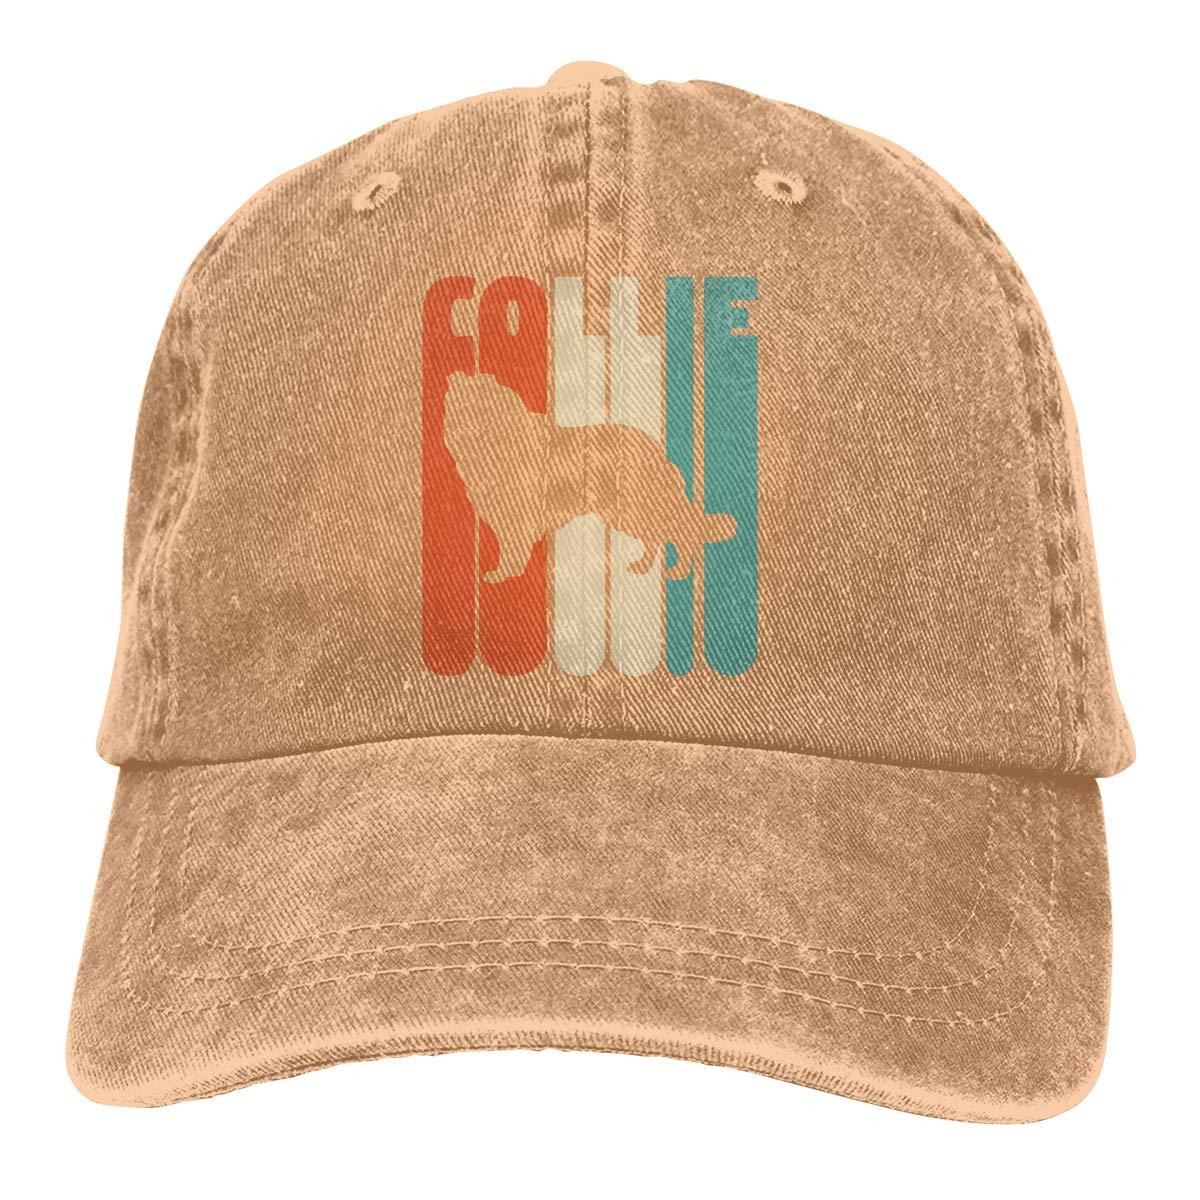 Men Women Adjustable Cotton Denim Baseball Cap Vintage Collie Dad Hat